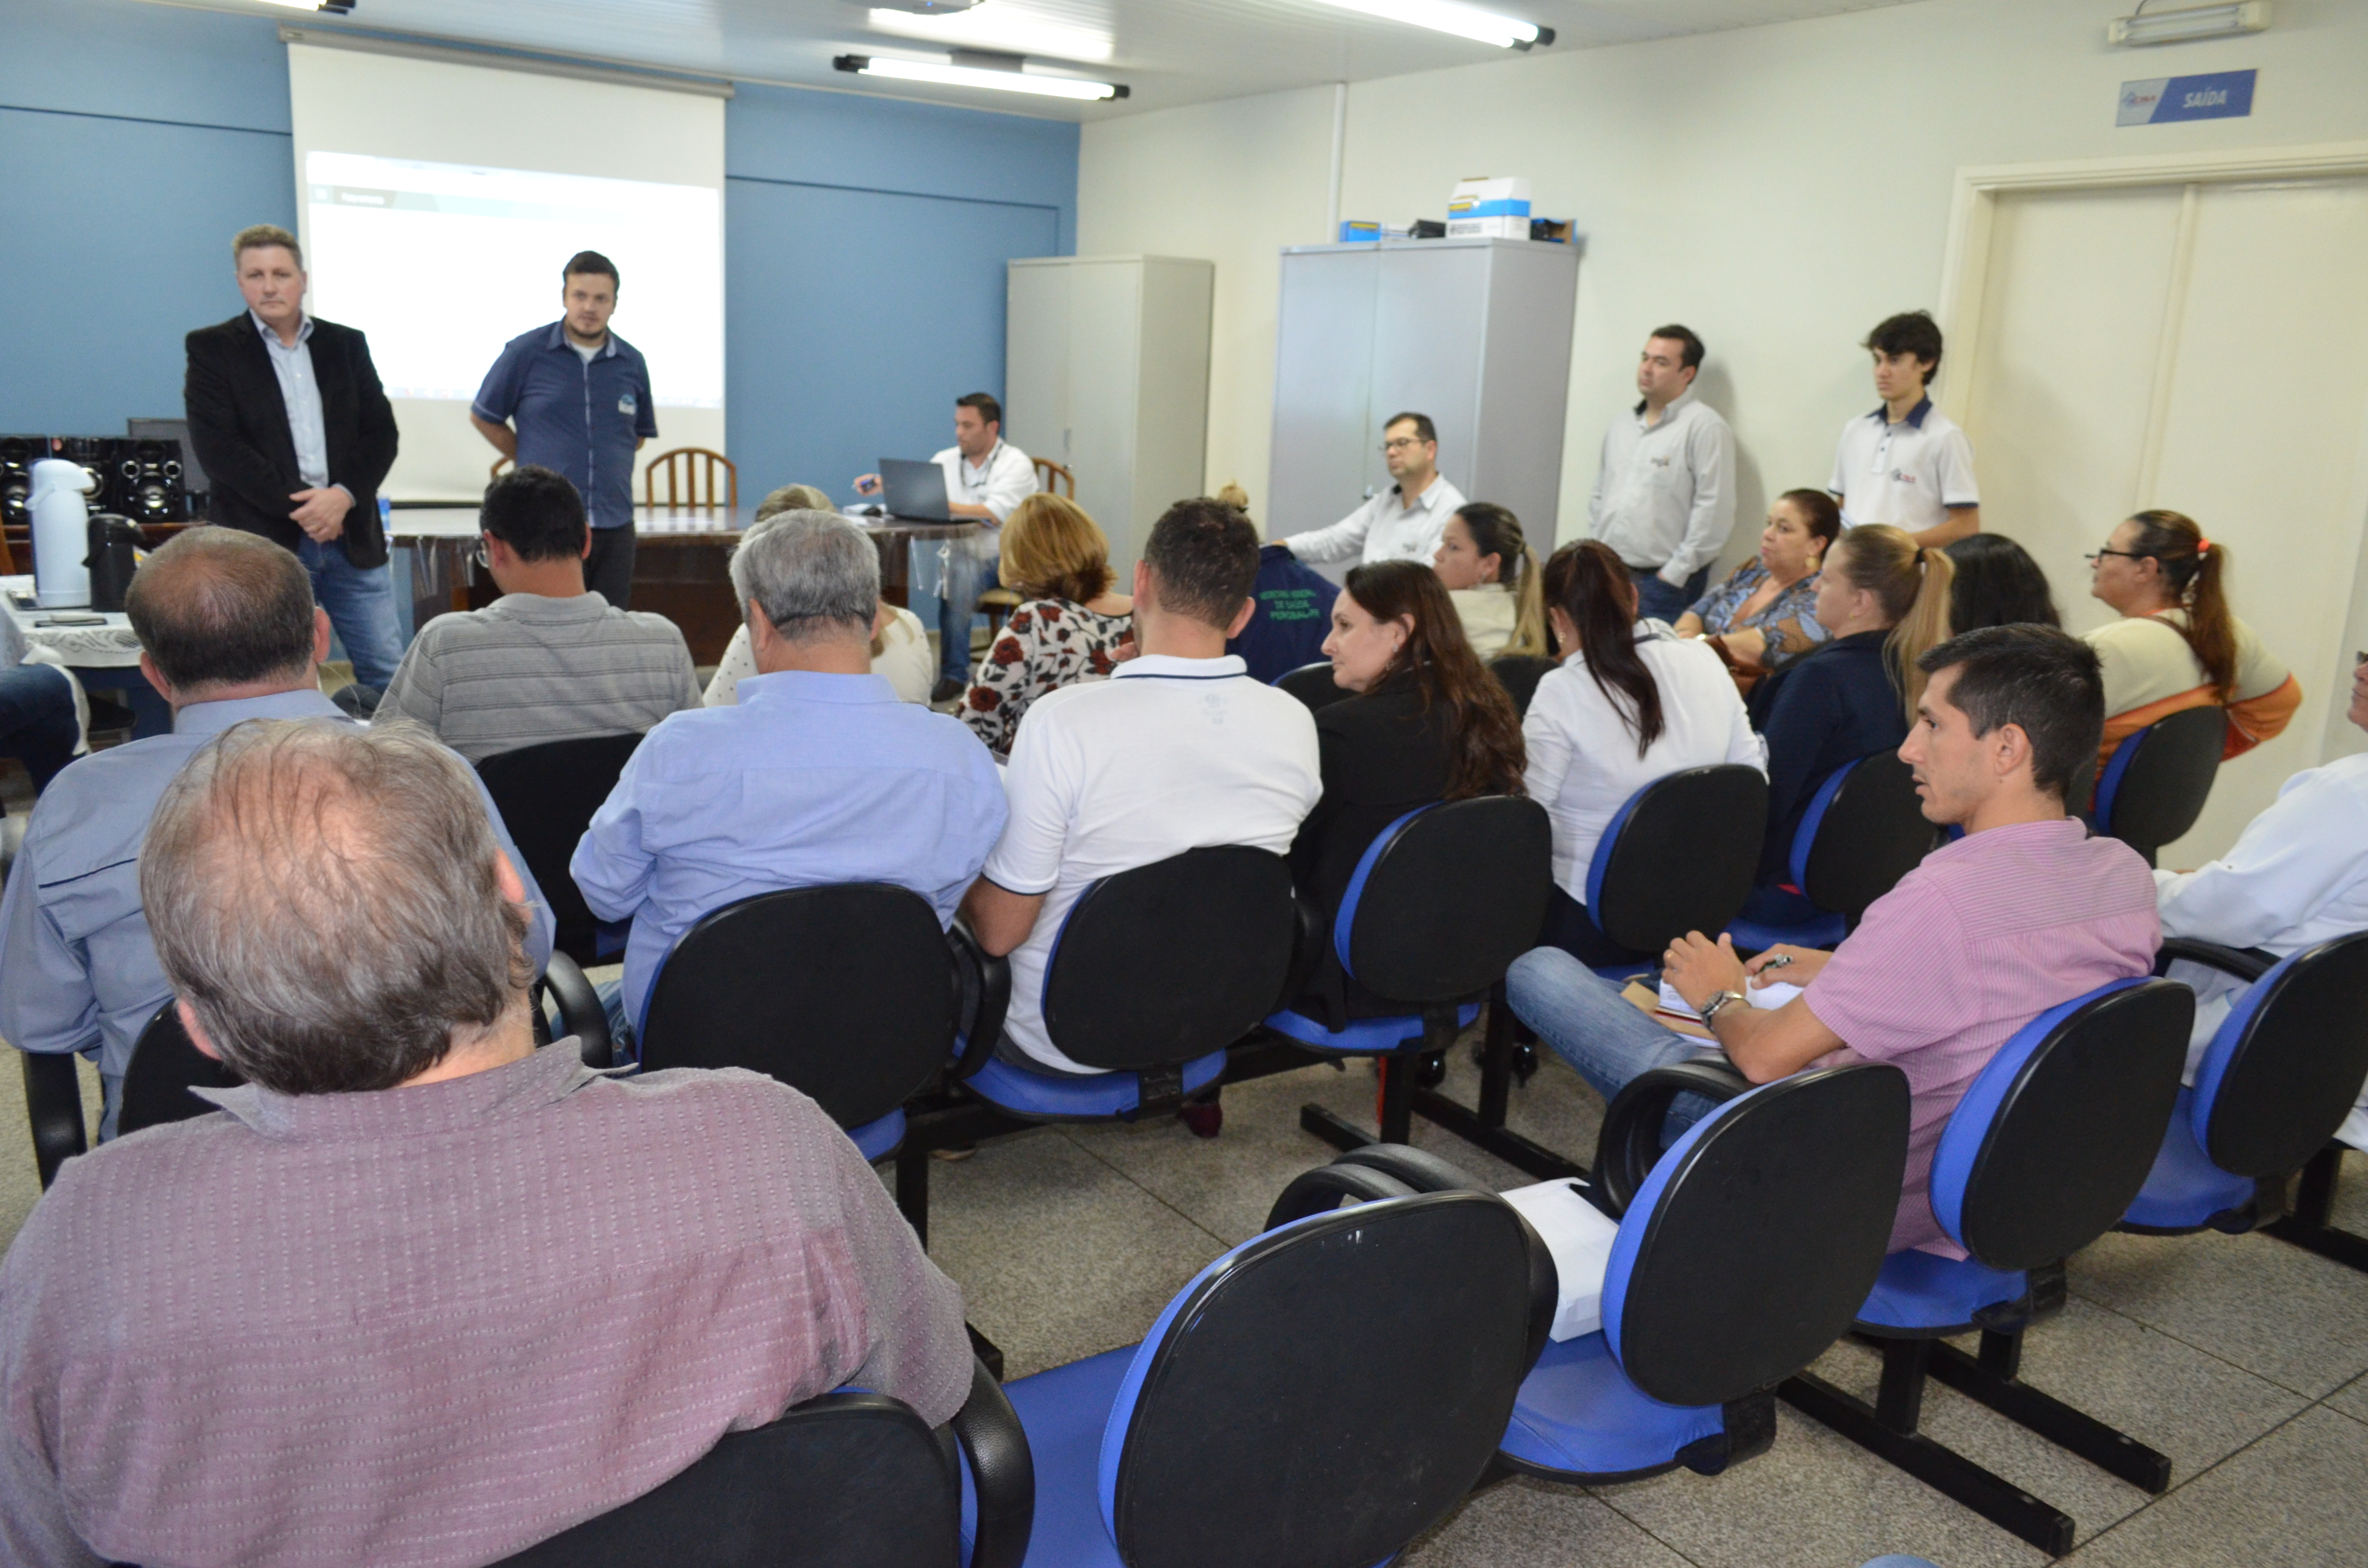 Noticia Destaque Gestores do Cisa-Amerios participam de treinamento para operar sistema de dados